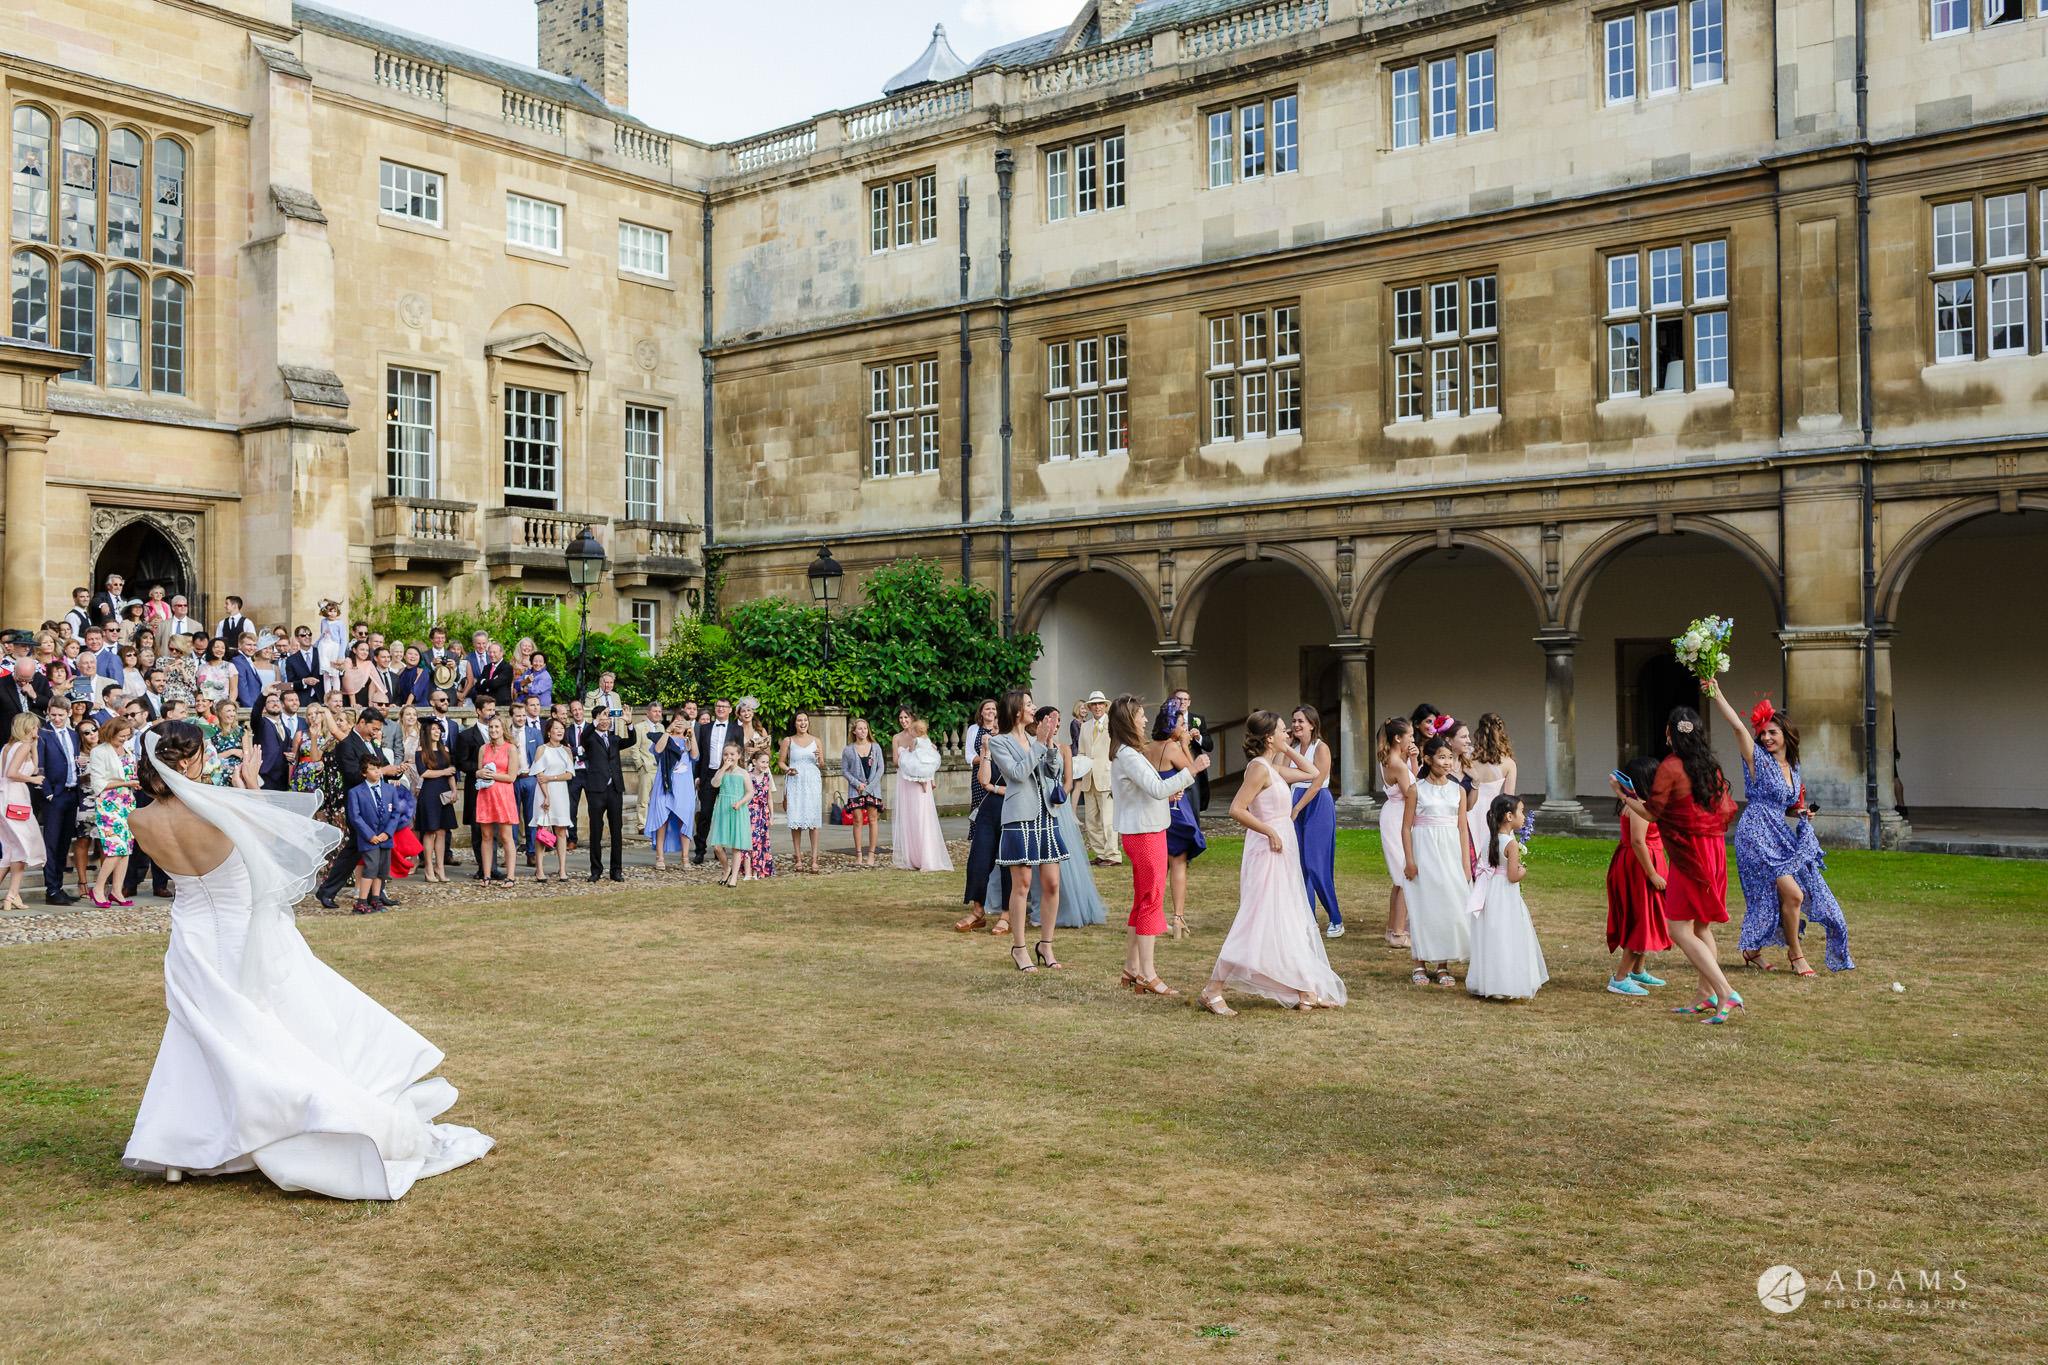 Trinity College Cambridge wedding brides friend catching a bouquet